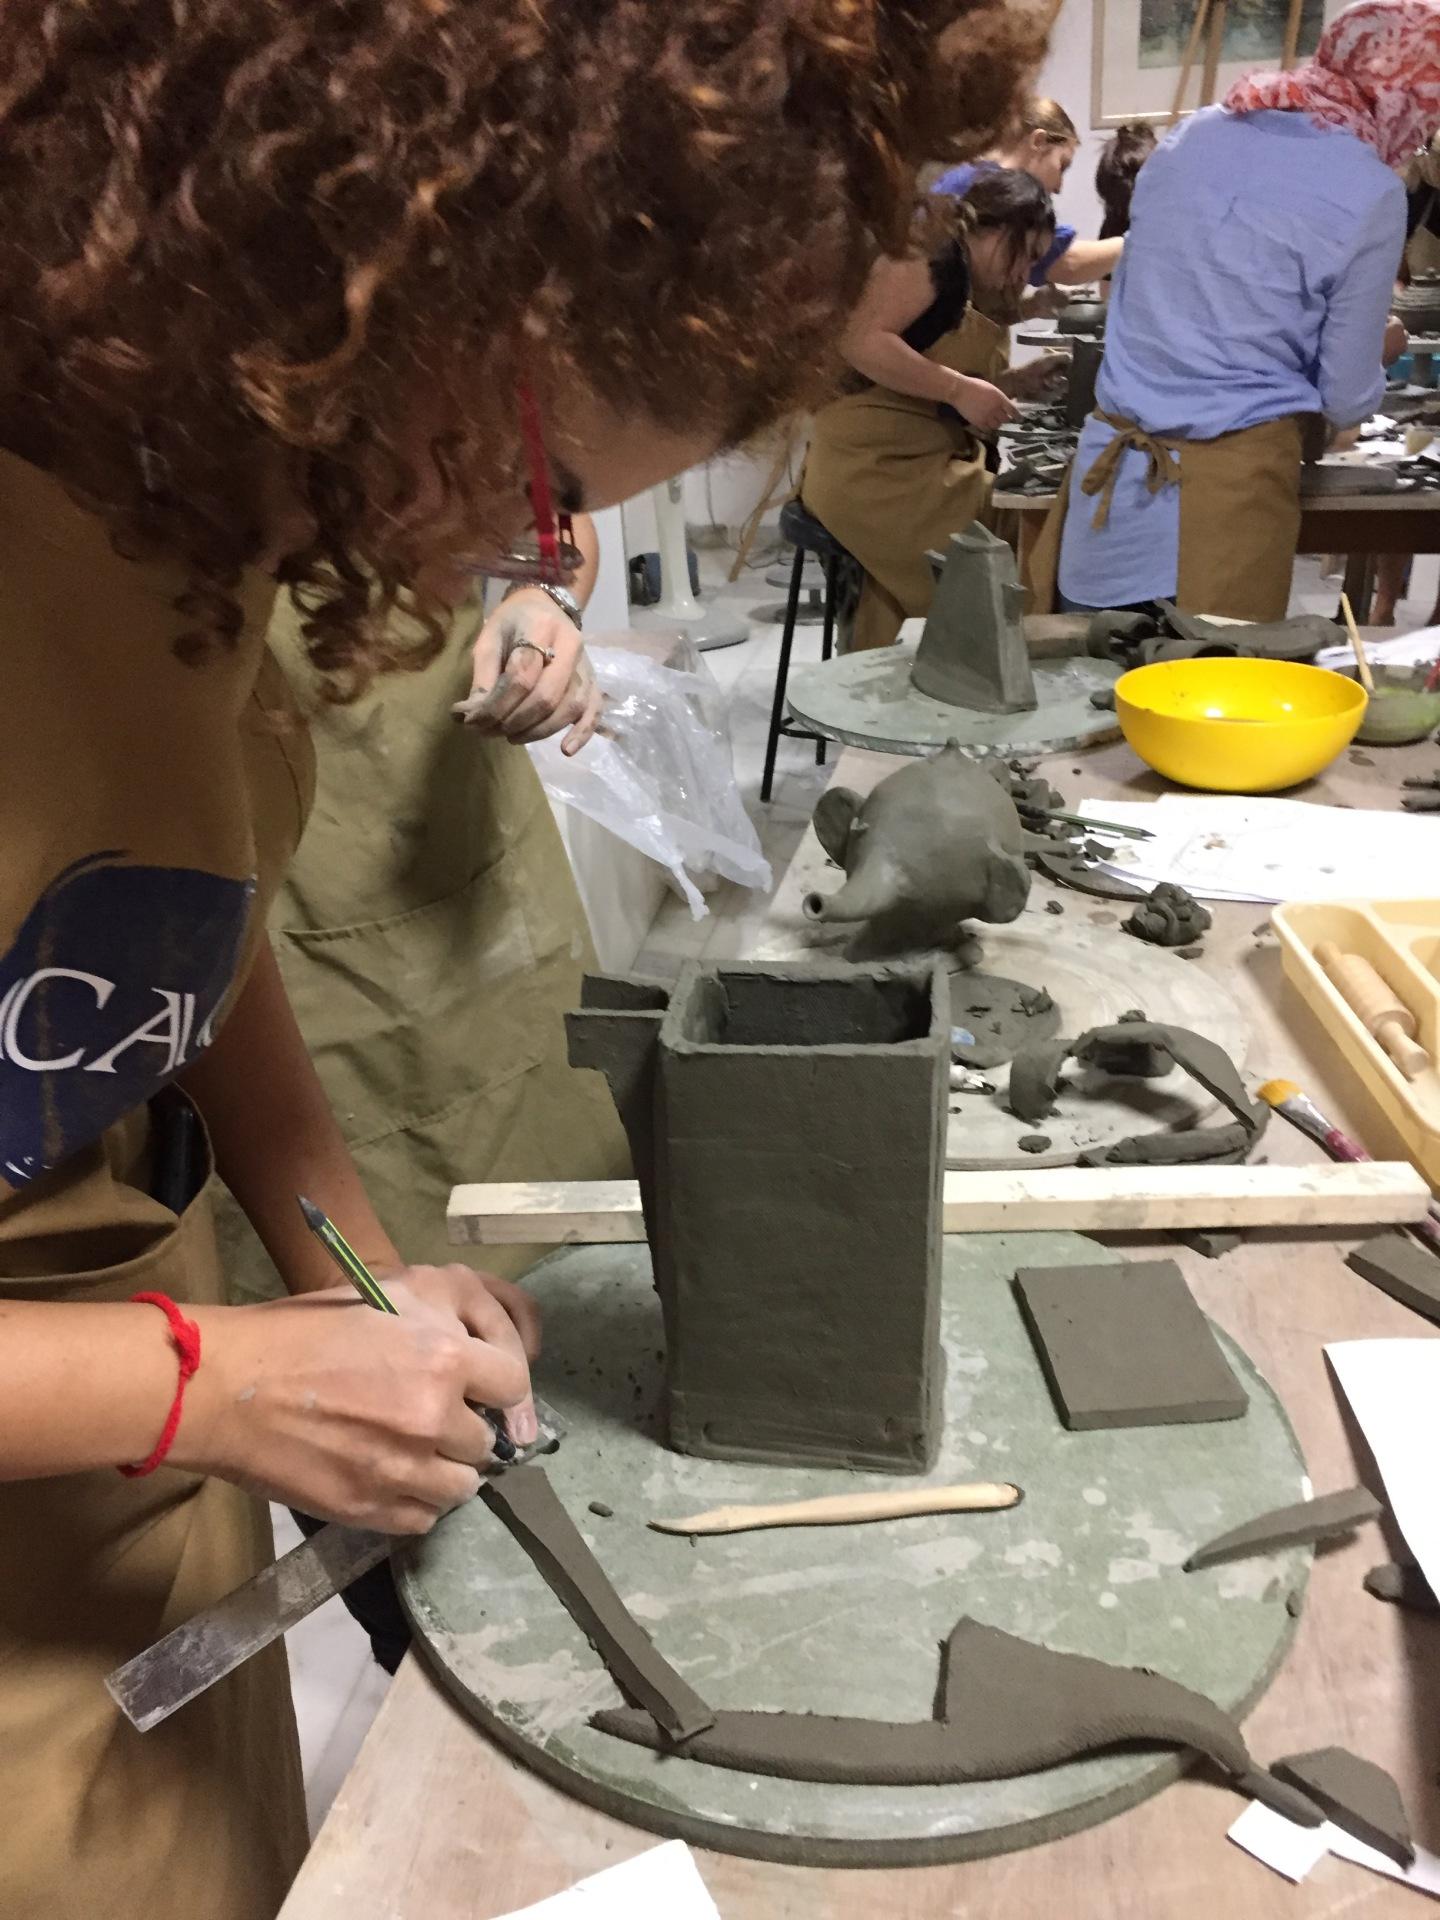 #saturdaynightpottery #pottery #cacamman #artclass #caramics #thursdaynightpottery